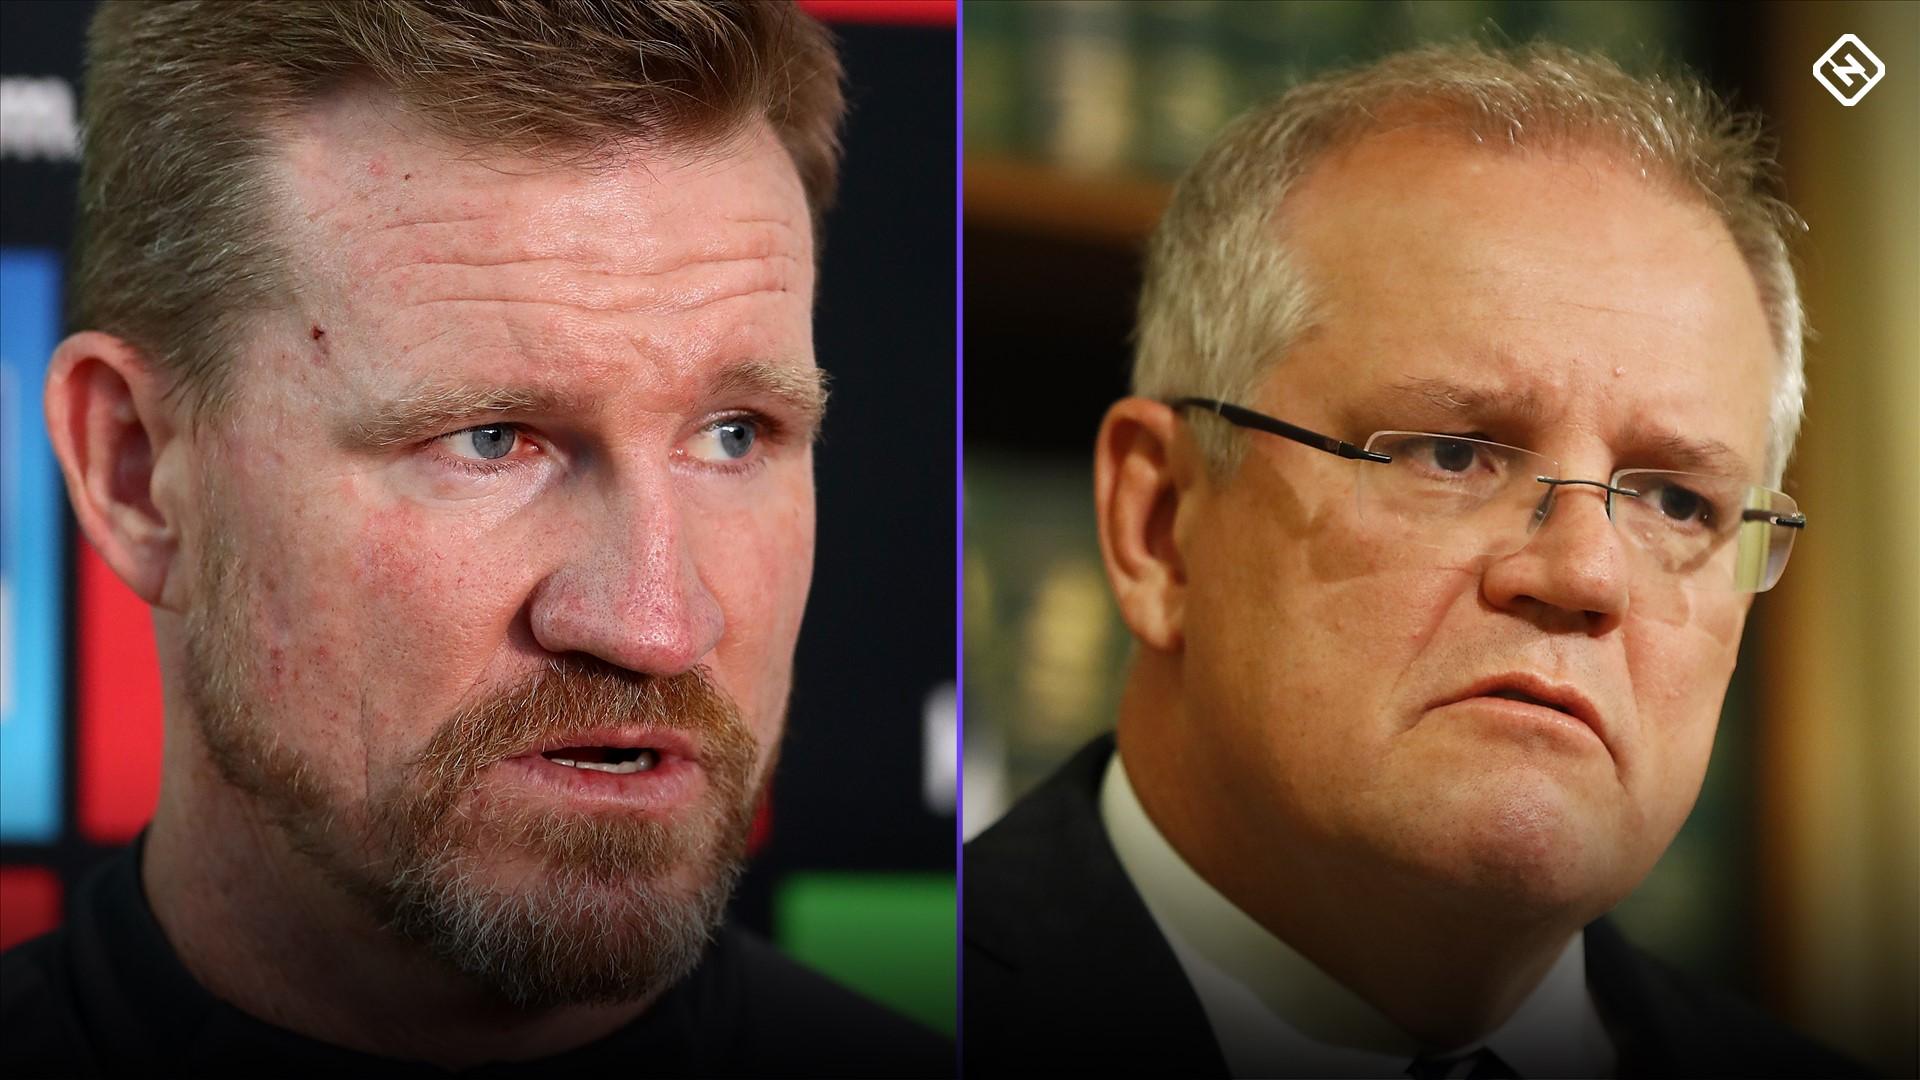 Collingwood Coach Nathan Buckley Delivers Searing Tweet To Scott Morrison Amid Bushfire Backlash Sporting News Australia